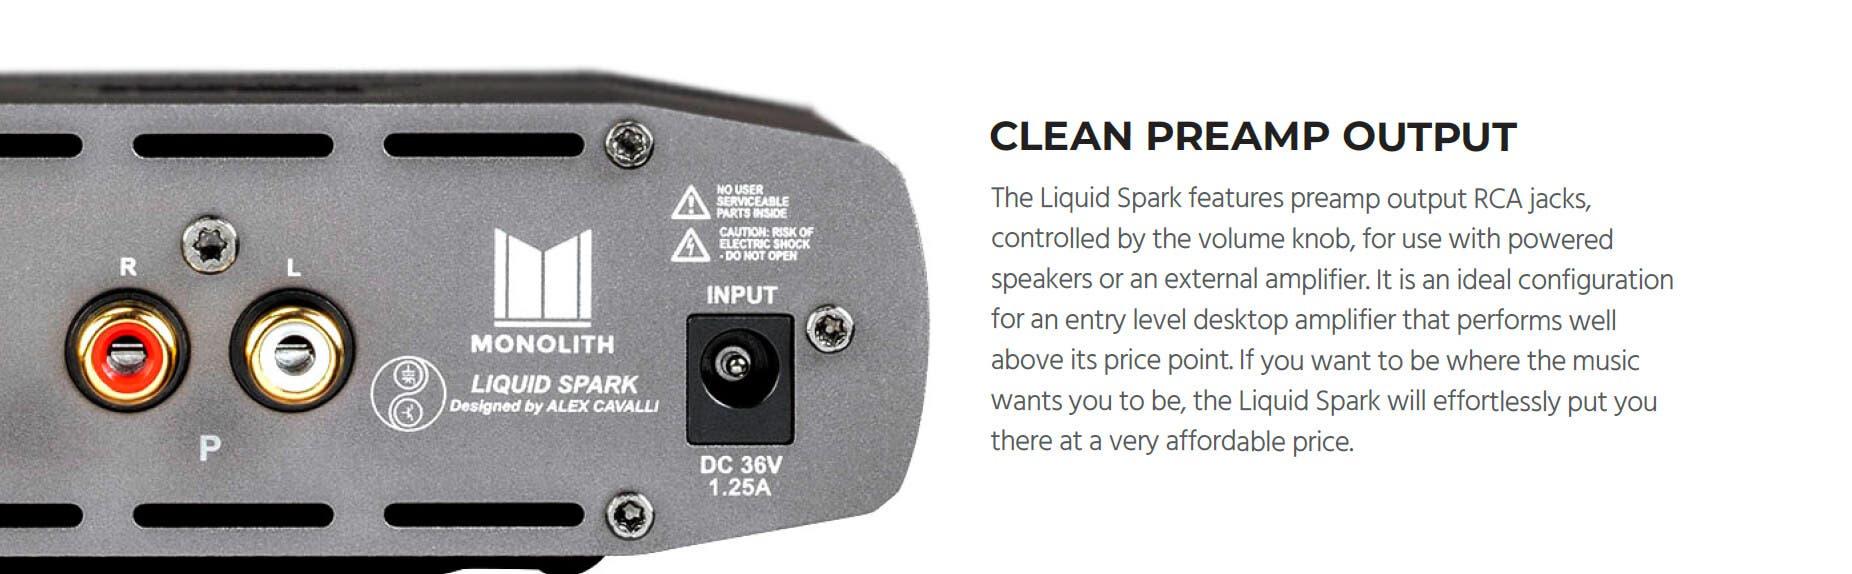 Monolith by Monoprice Liquid Spark Headphone Amplifier by Alex